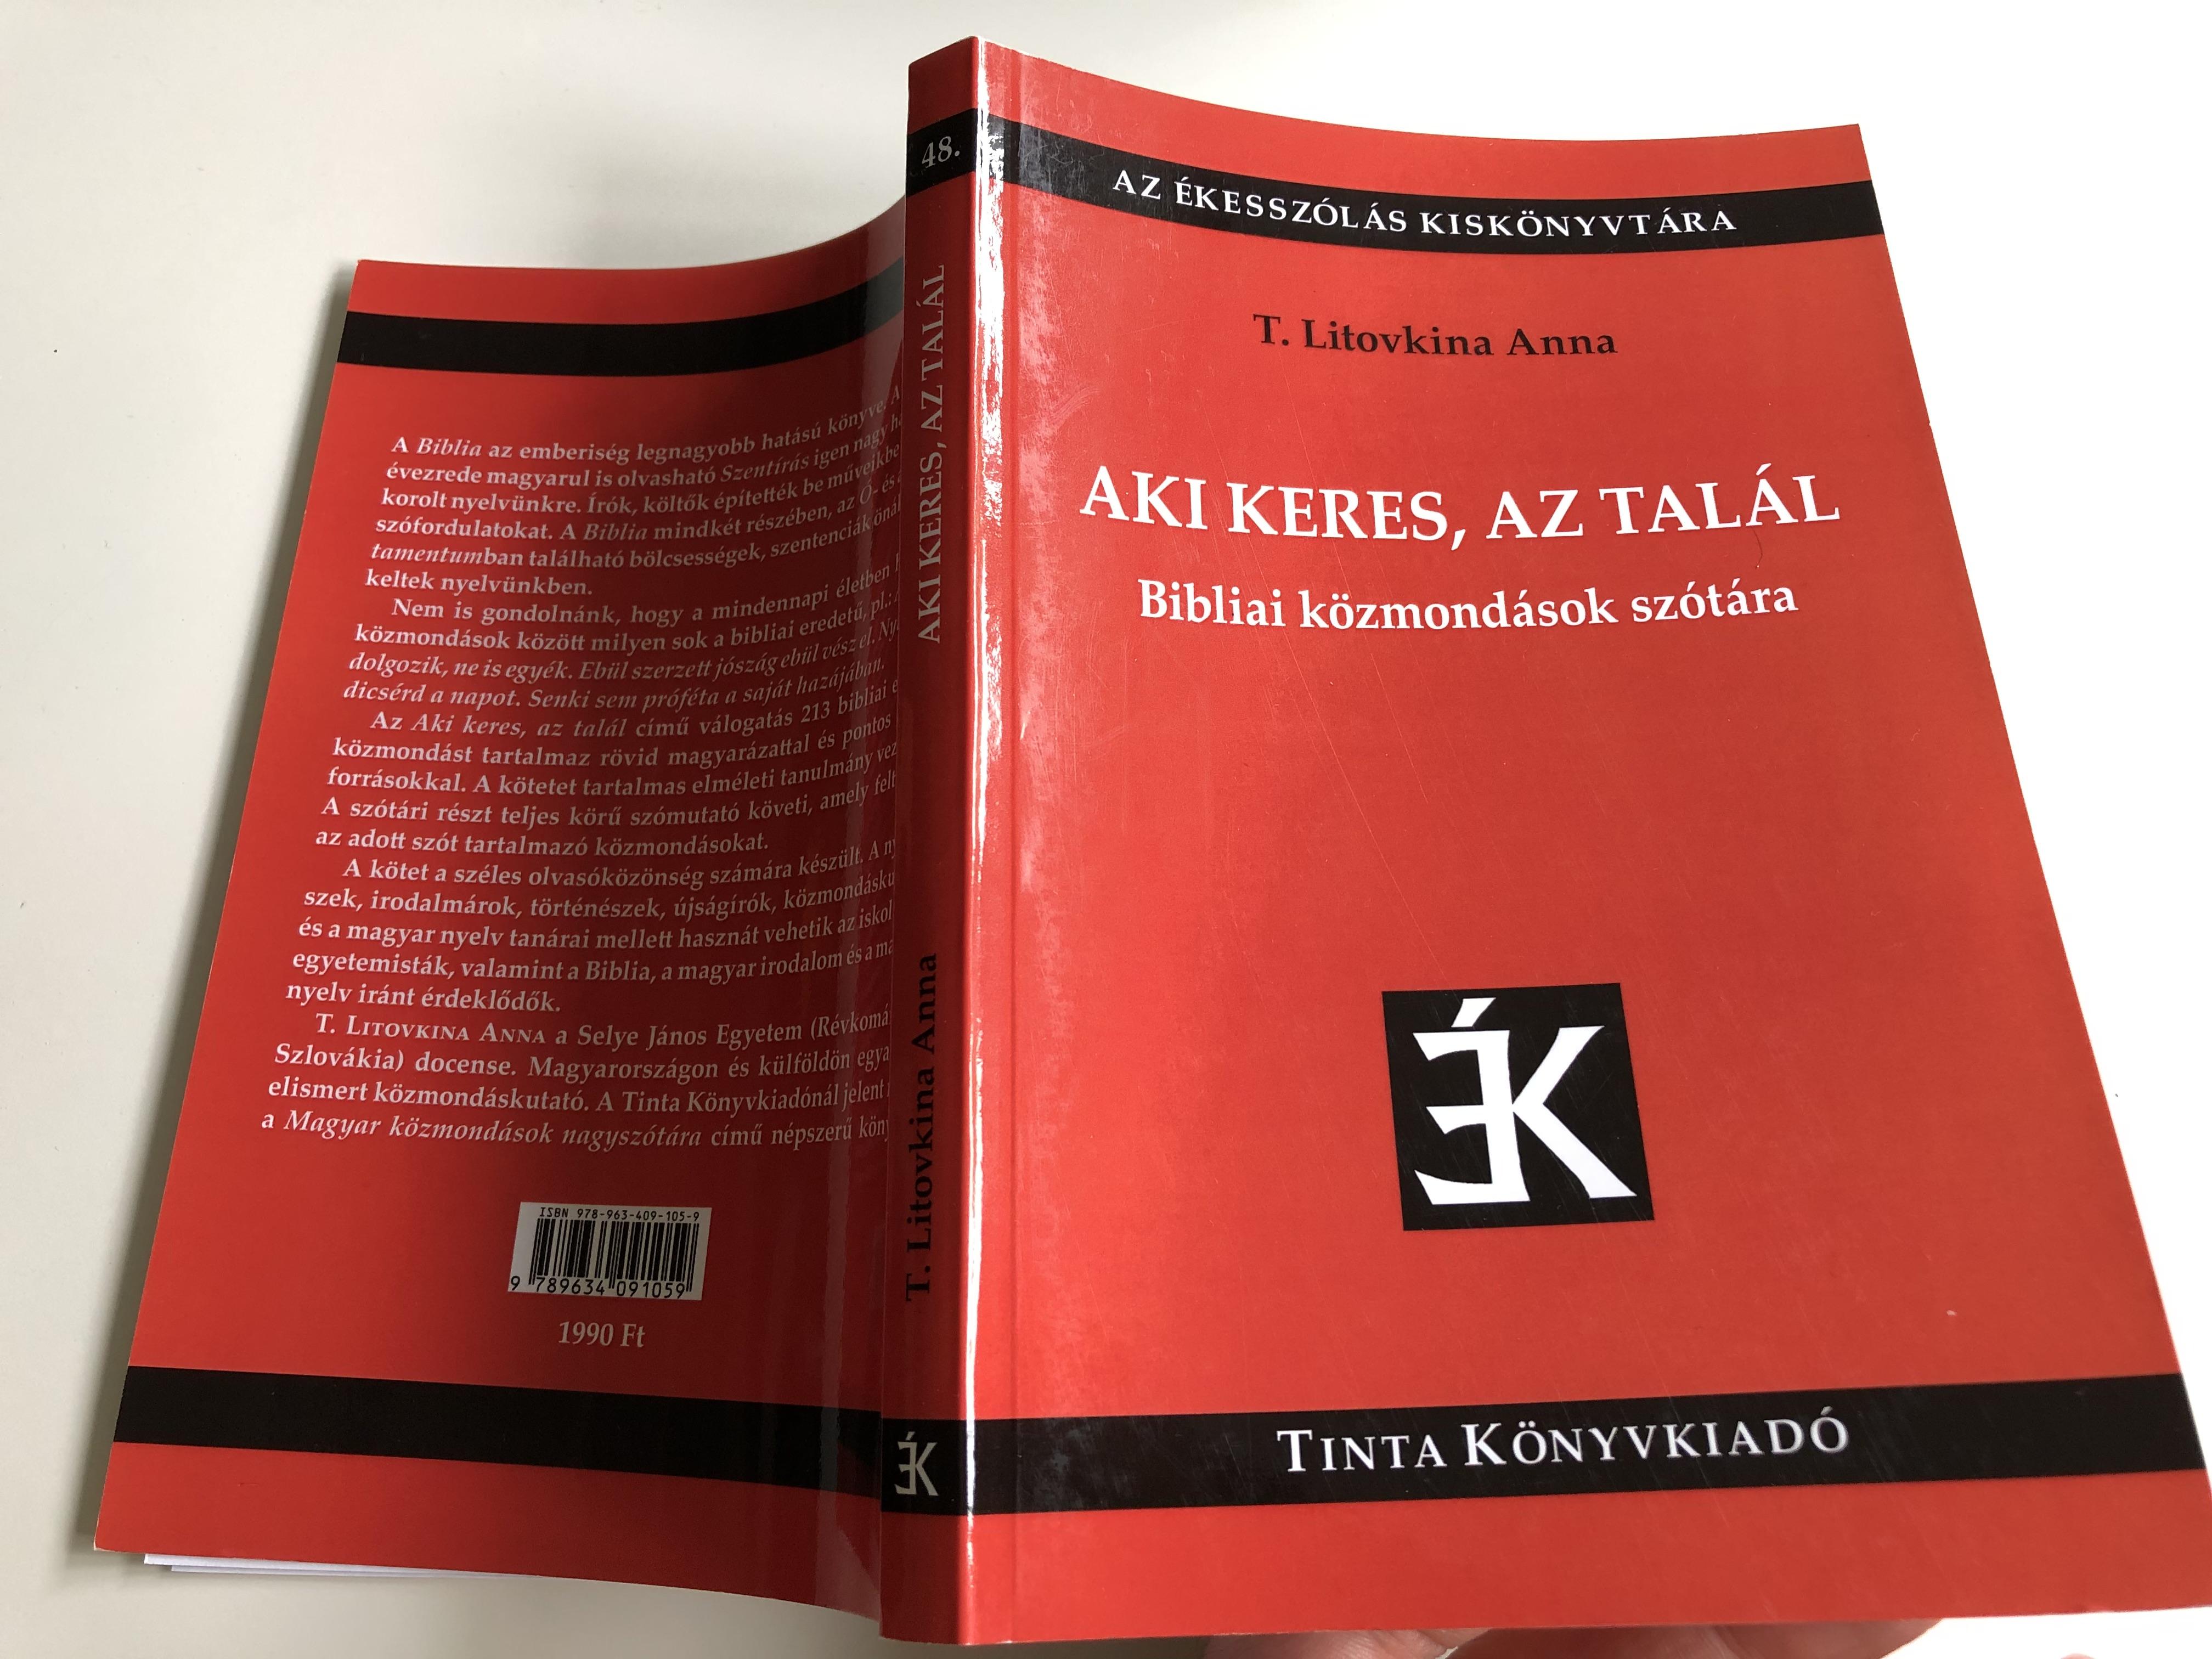 aki-keres-az-tal-l-bibliai-k-zmond-sok-sz-t-ra-by-t.-litovkina-anna-seek-and-ye-shall-find-hungarian-language-dictionary-of-biblical-sayings-and-phrases-tinta-k-nyvkiad-az-kessz-l-s-kisk-nyvt-ra-16-.jpg